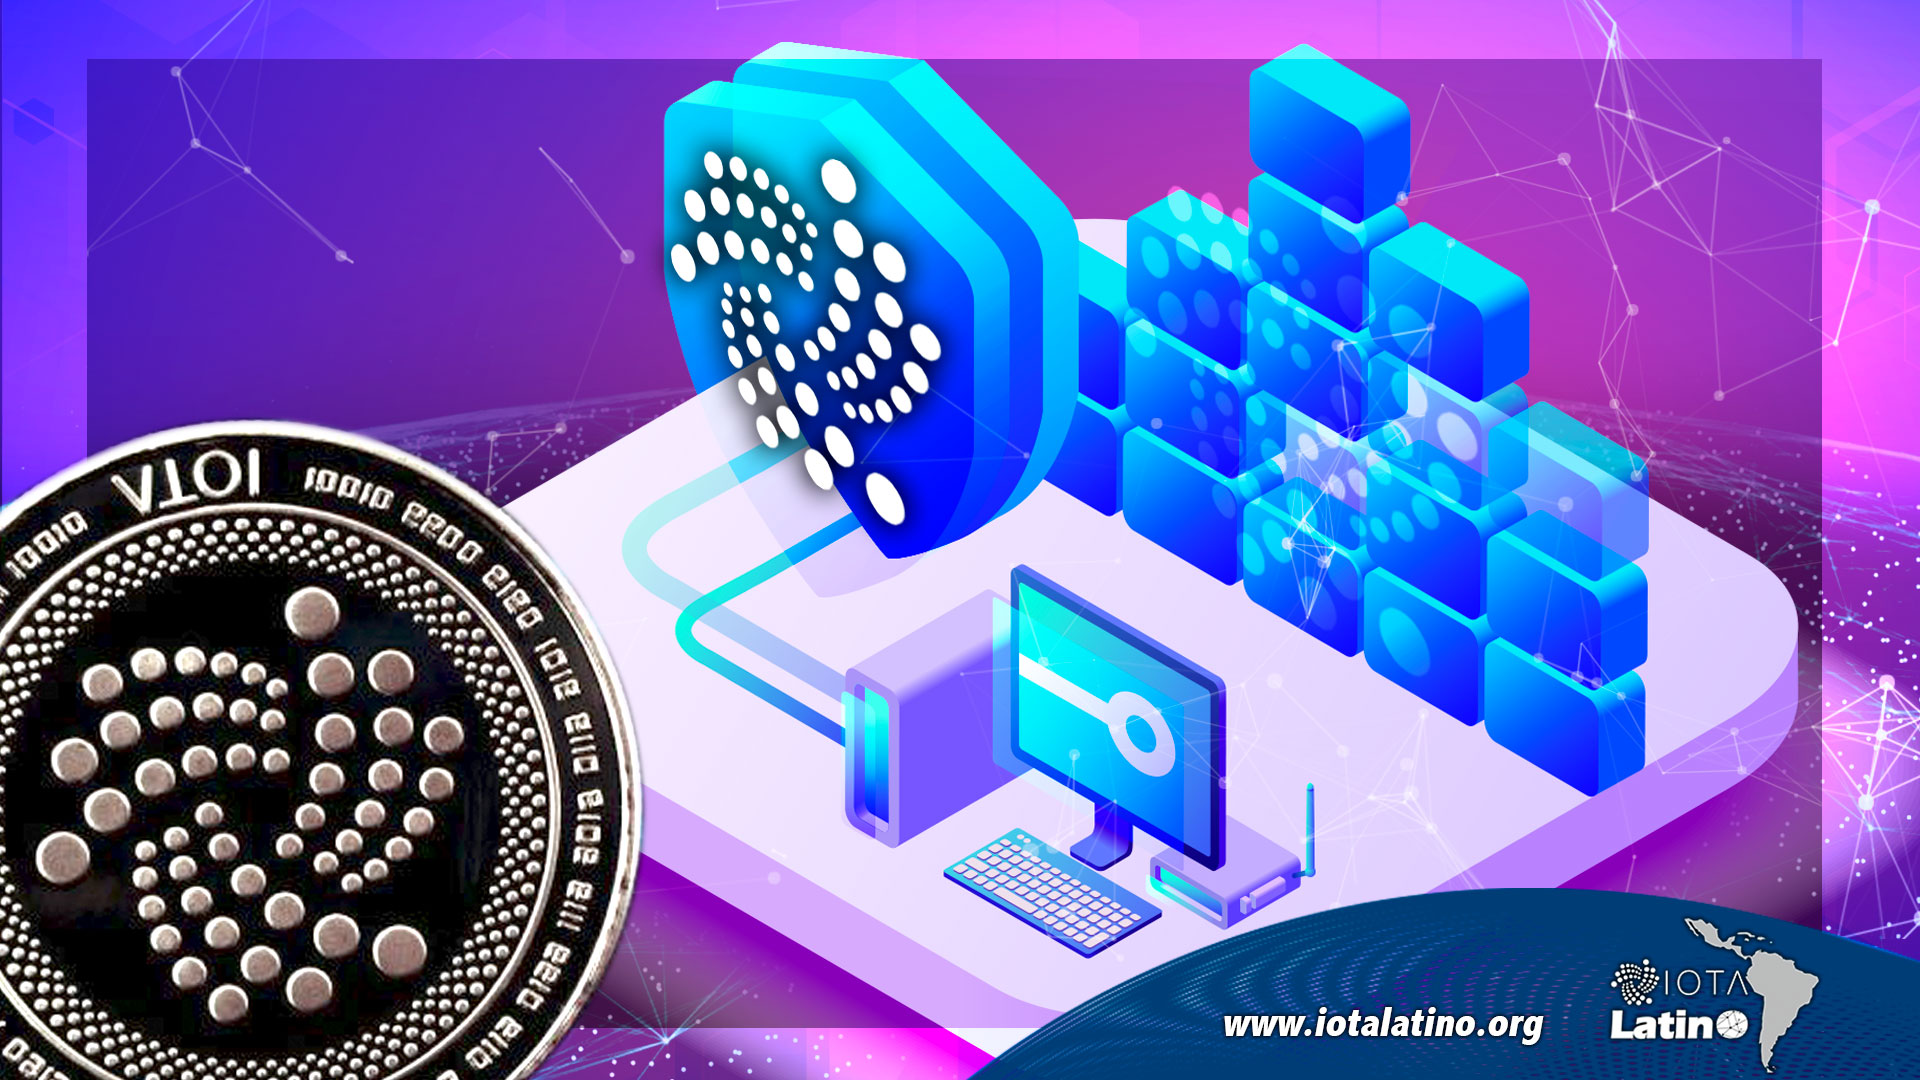 iotalatino - IOTA-Pago-digital-Iota-02